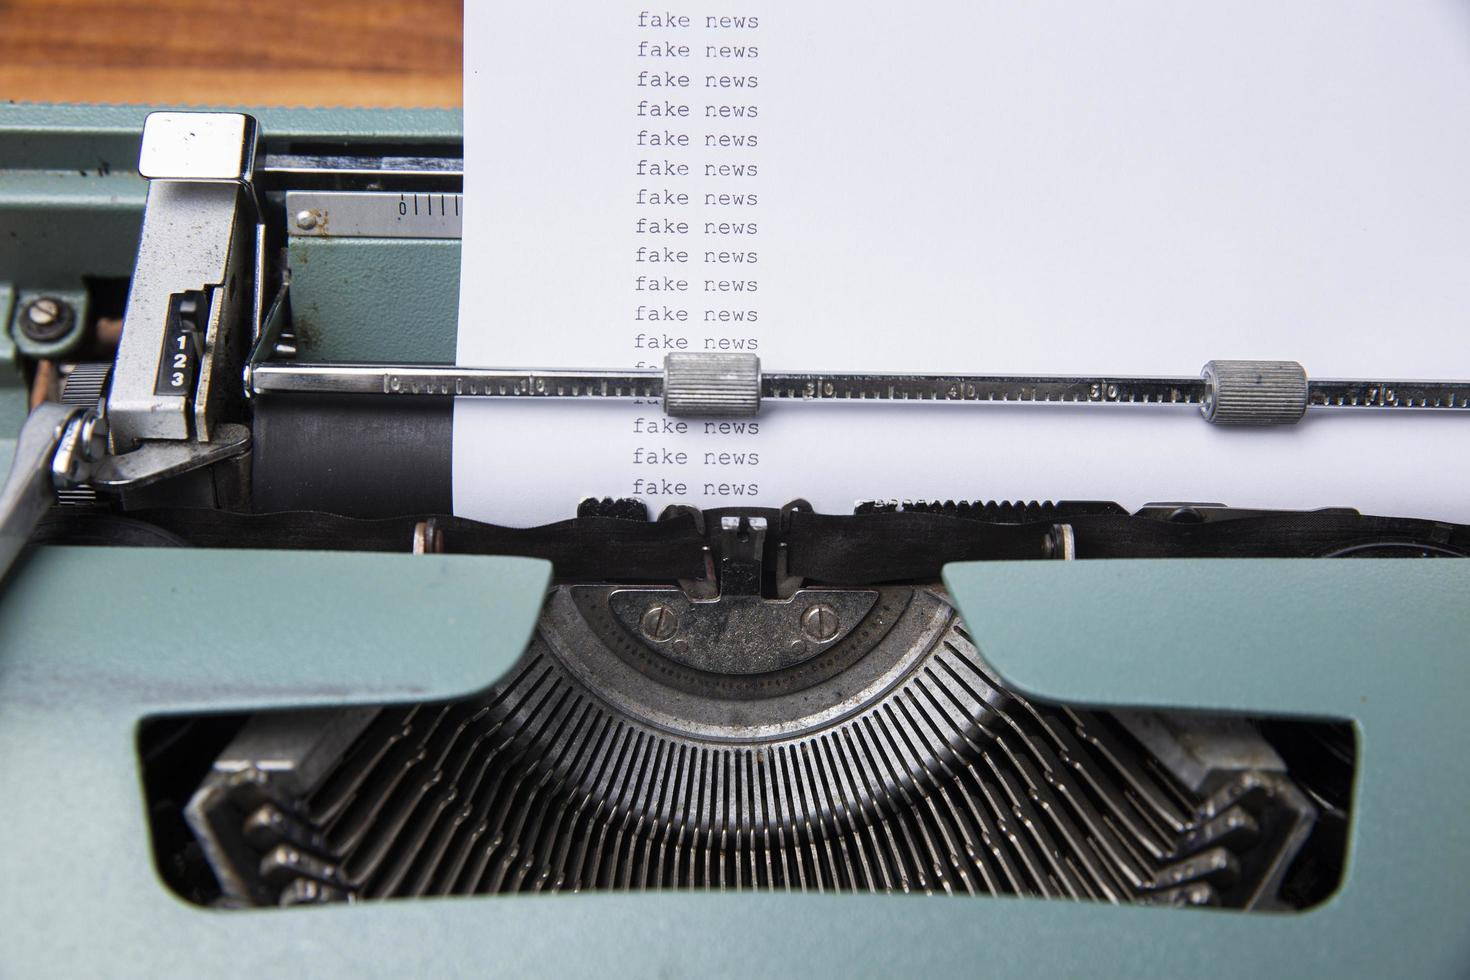 concepto de noticias falsas, escrito en máquina de escribir foto